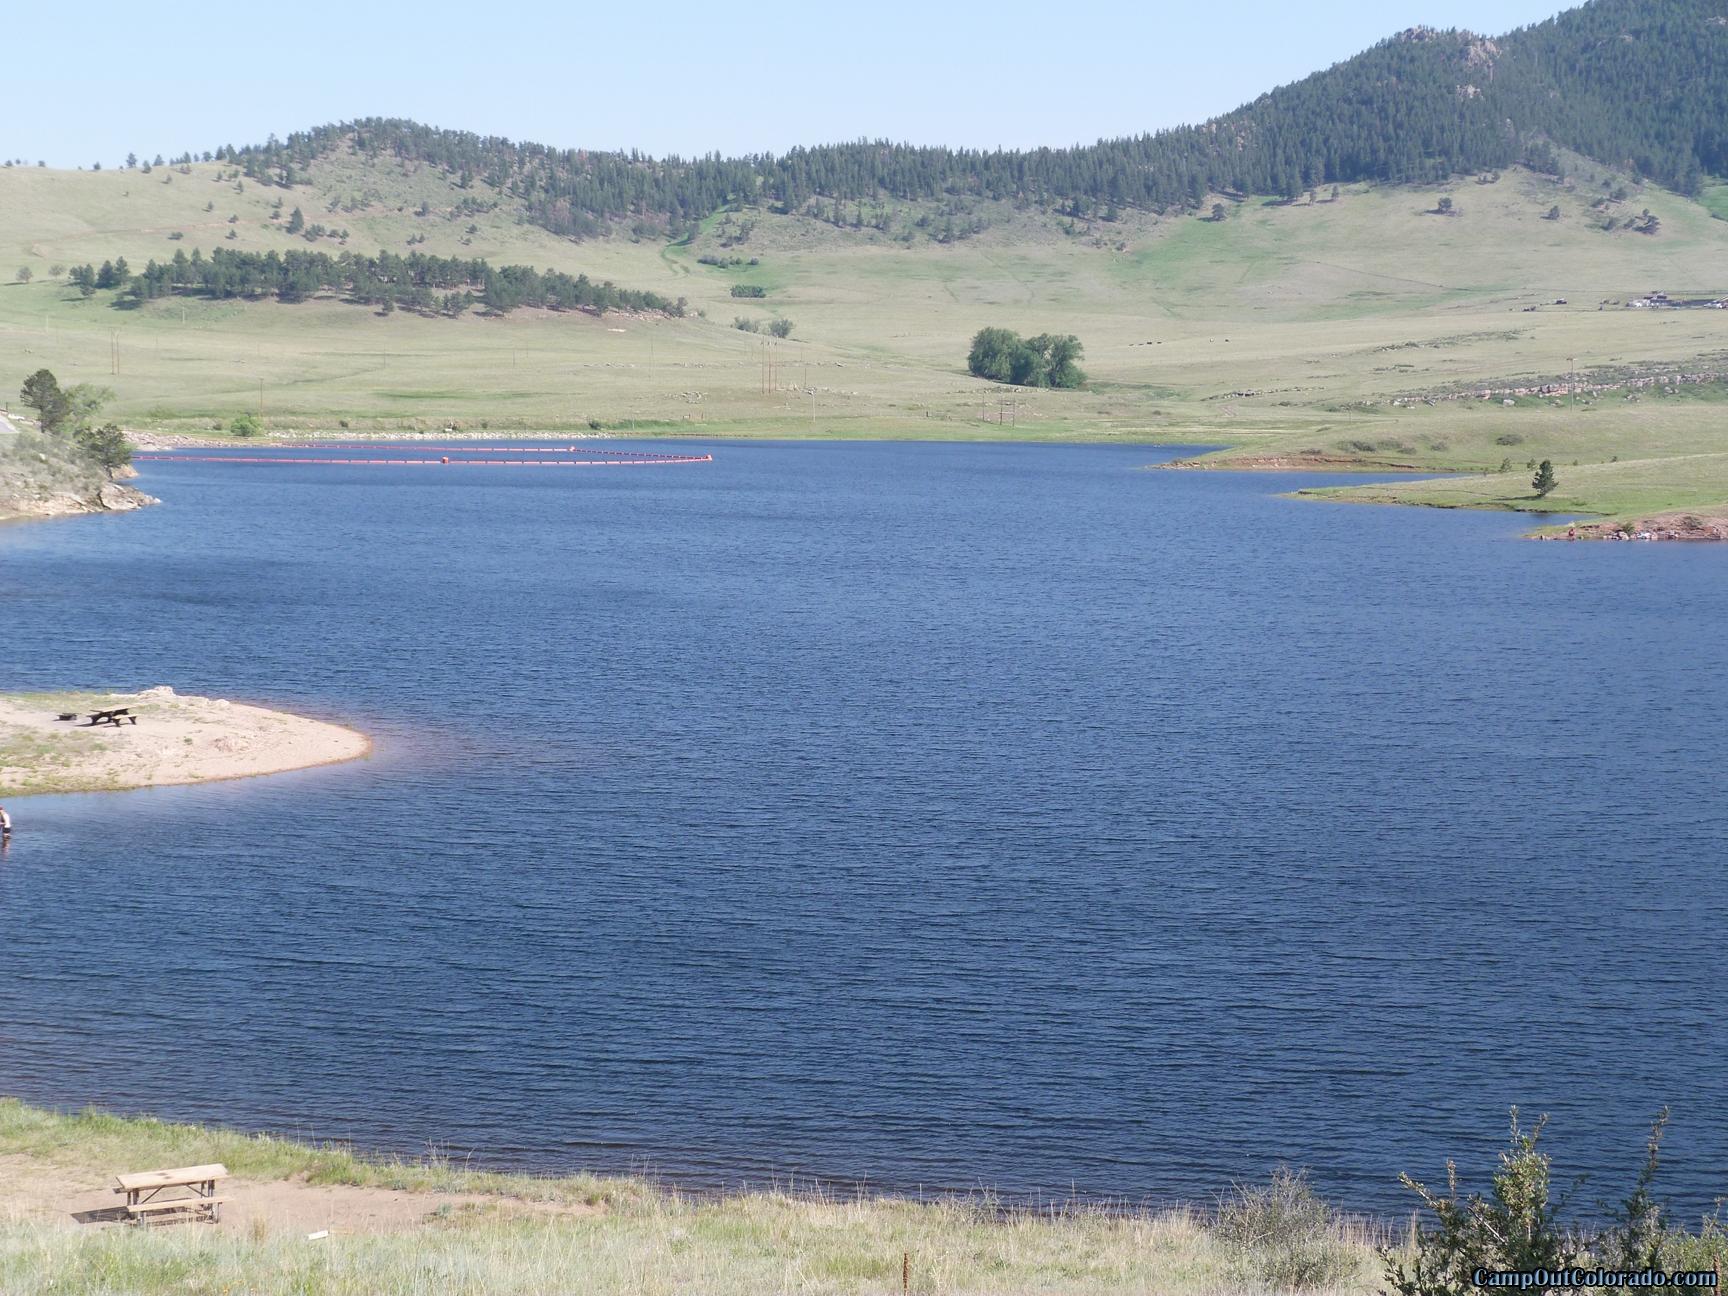 camp-out-colorado-pinewood-long-lake-view